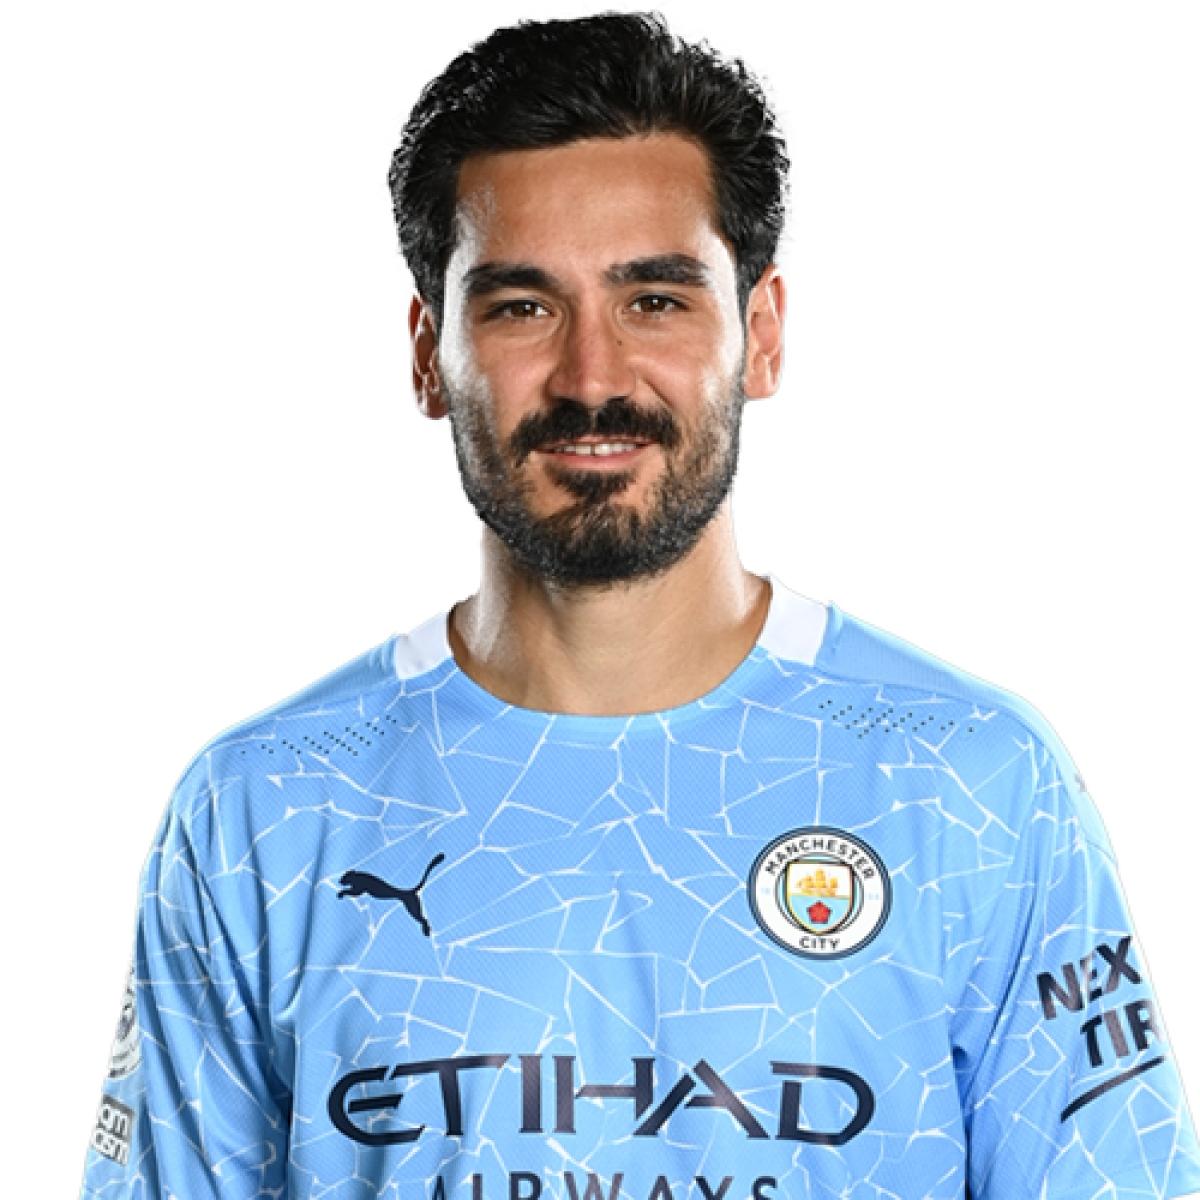 8. Ilkay Gündogan (Manchester City) 12 bàn thắng.